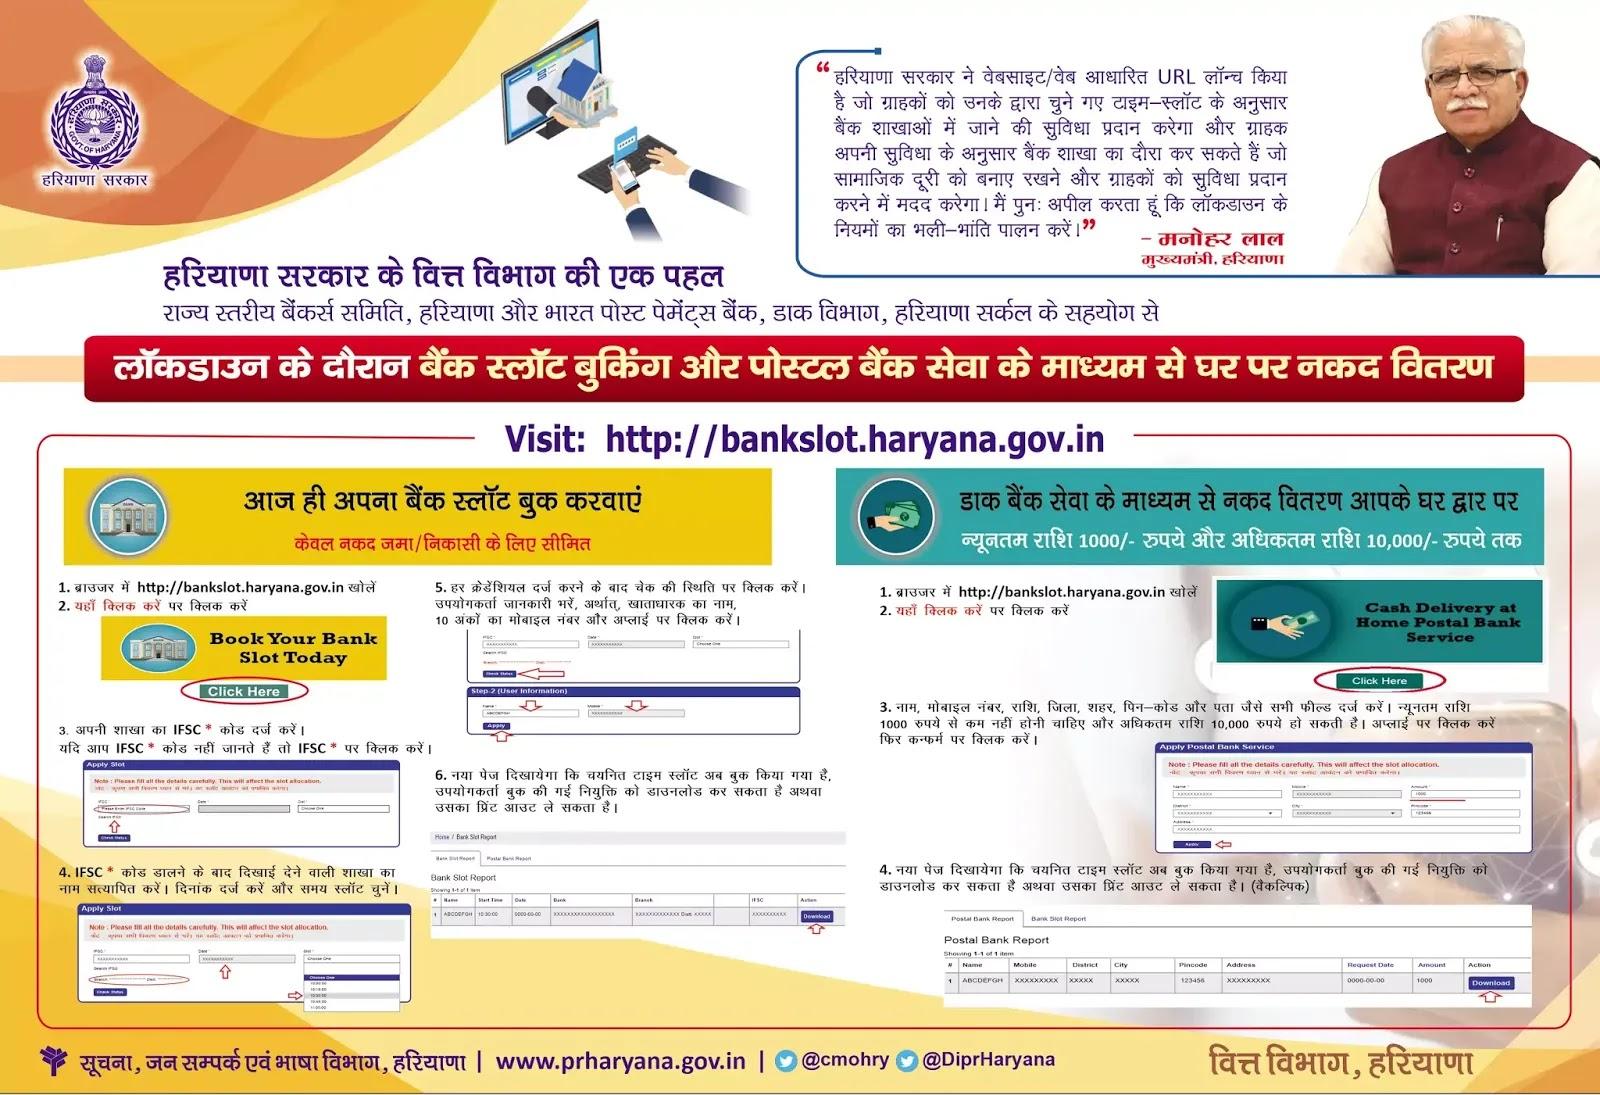 Bankslot.haryana.gov.in - Bankslot haryana gov in